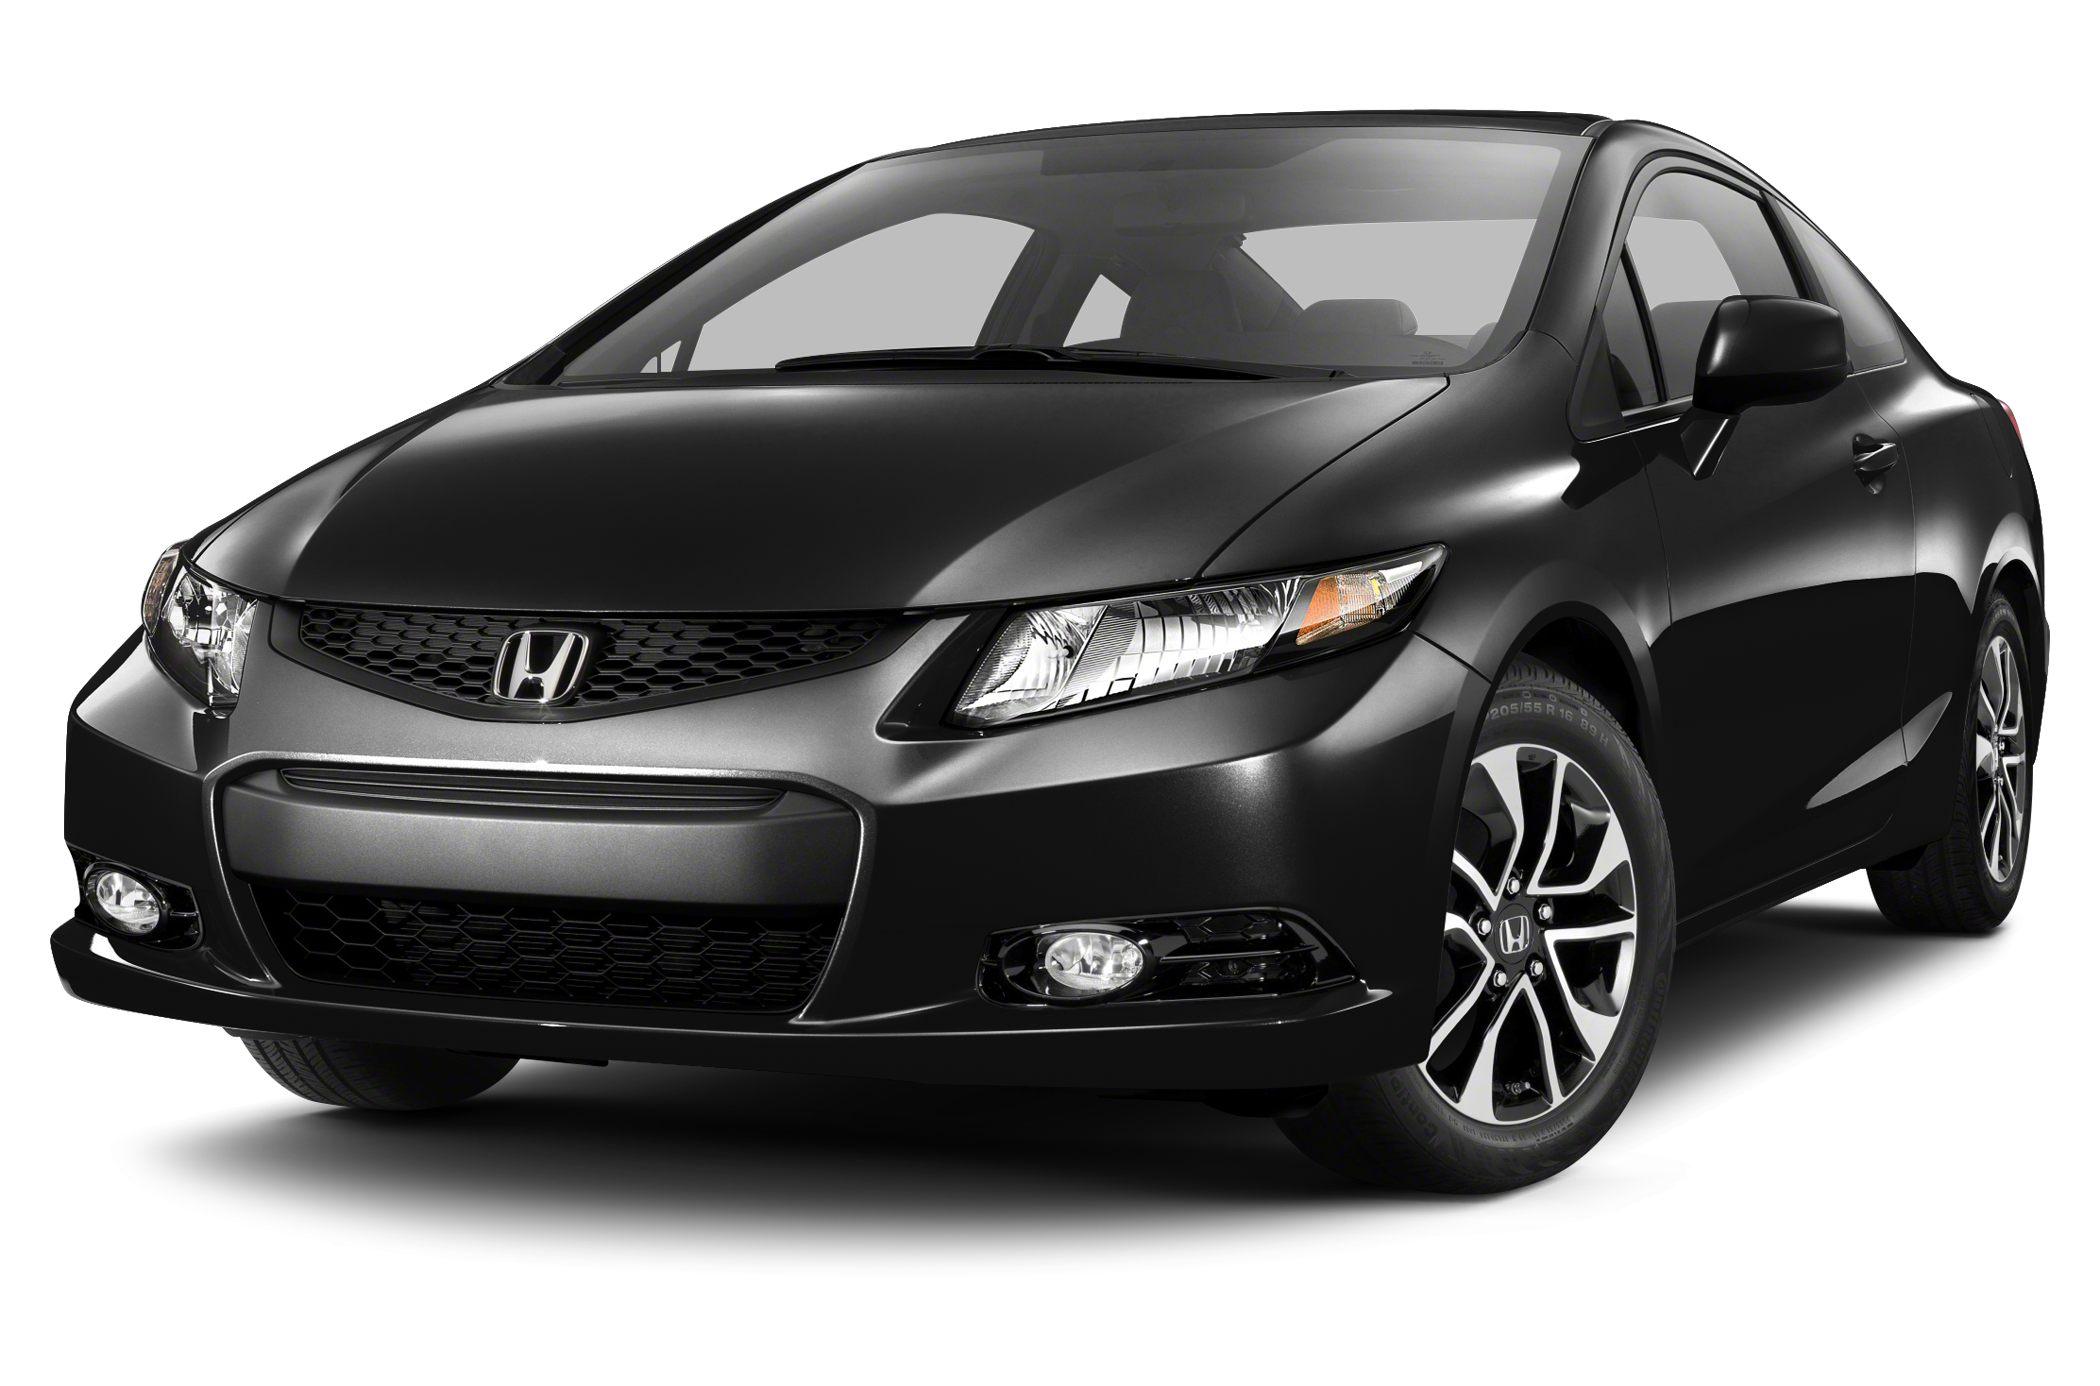 2013 Honda Civic EX Miles 38332Stock t9467 VIN 2HGFG3B81DH514632